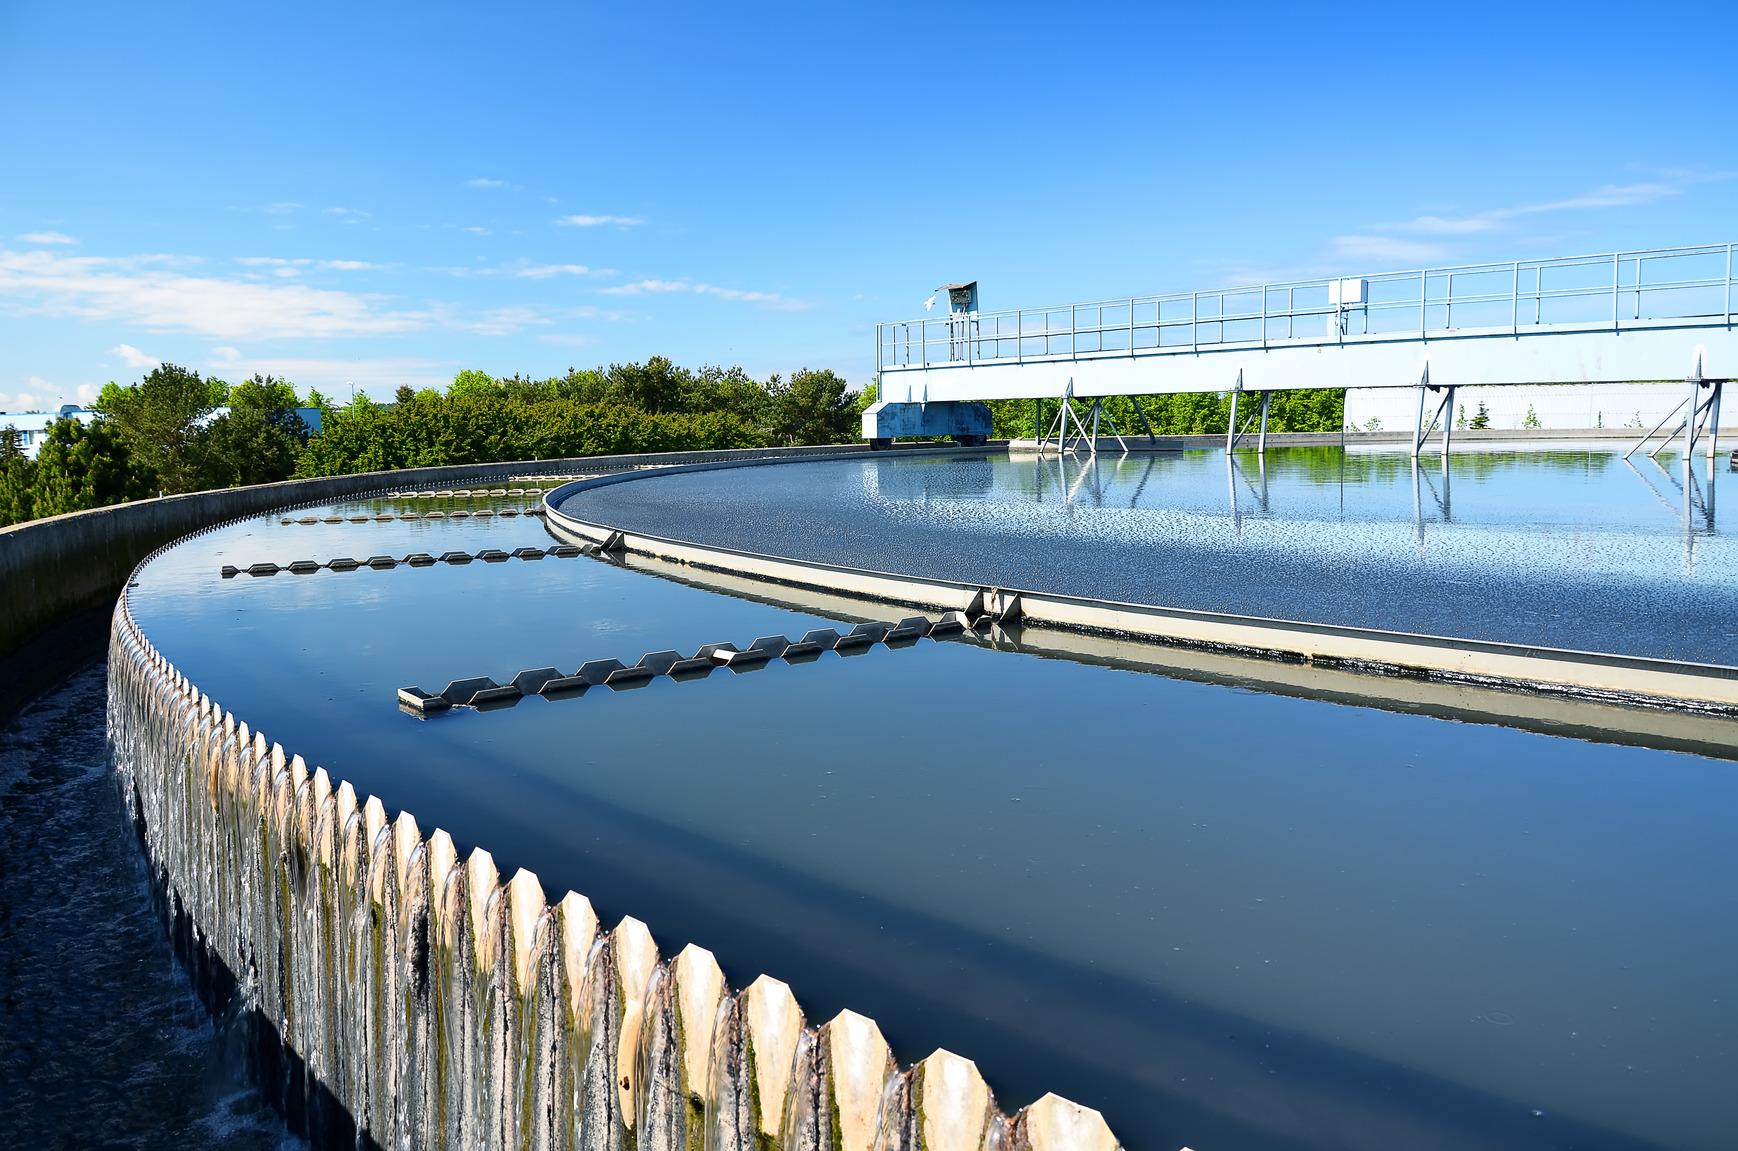 Wastewater treatment photo